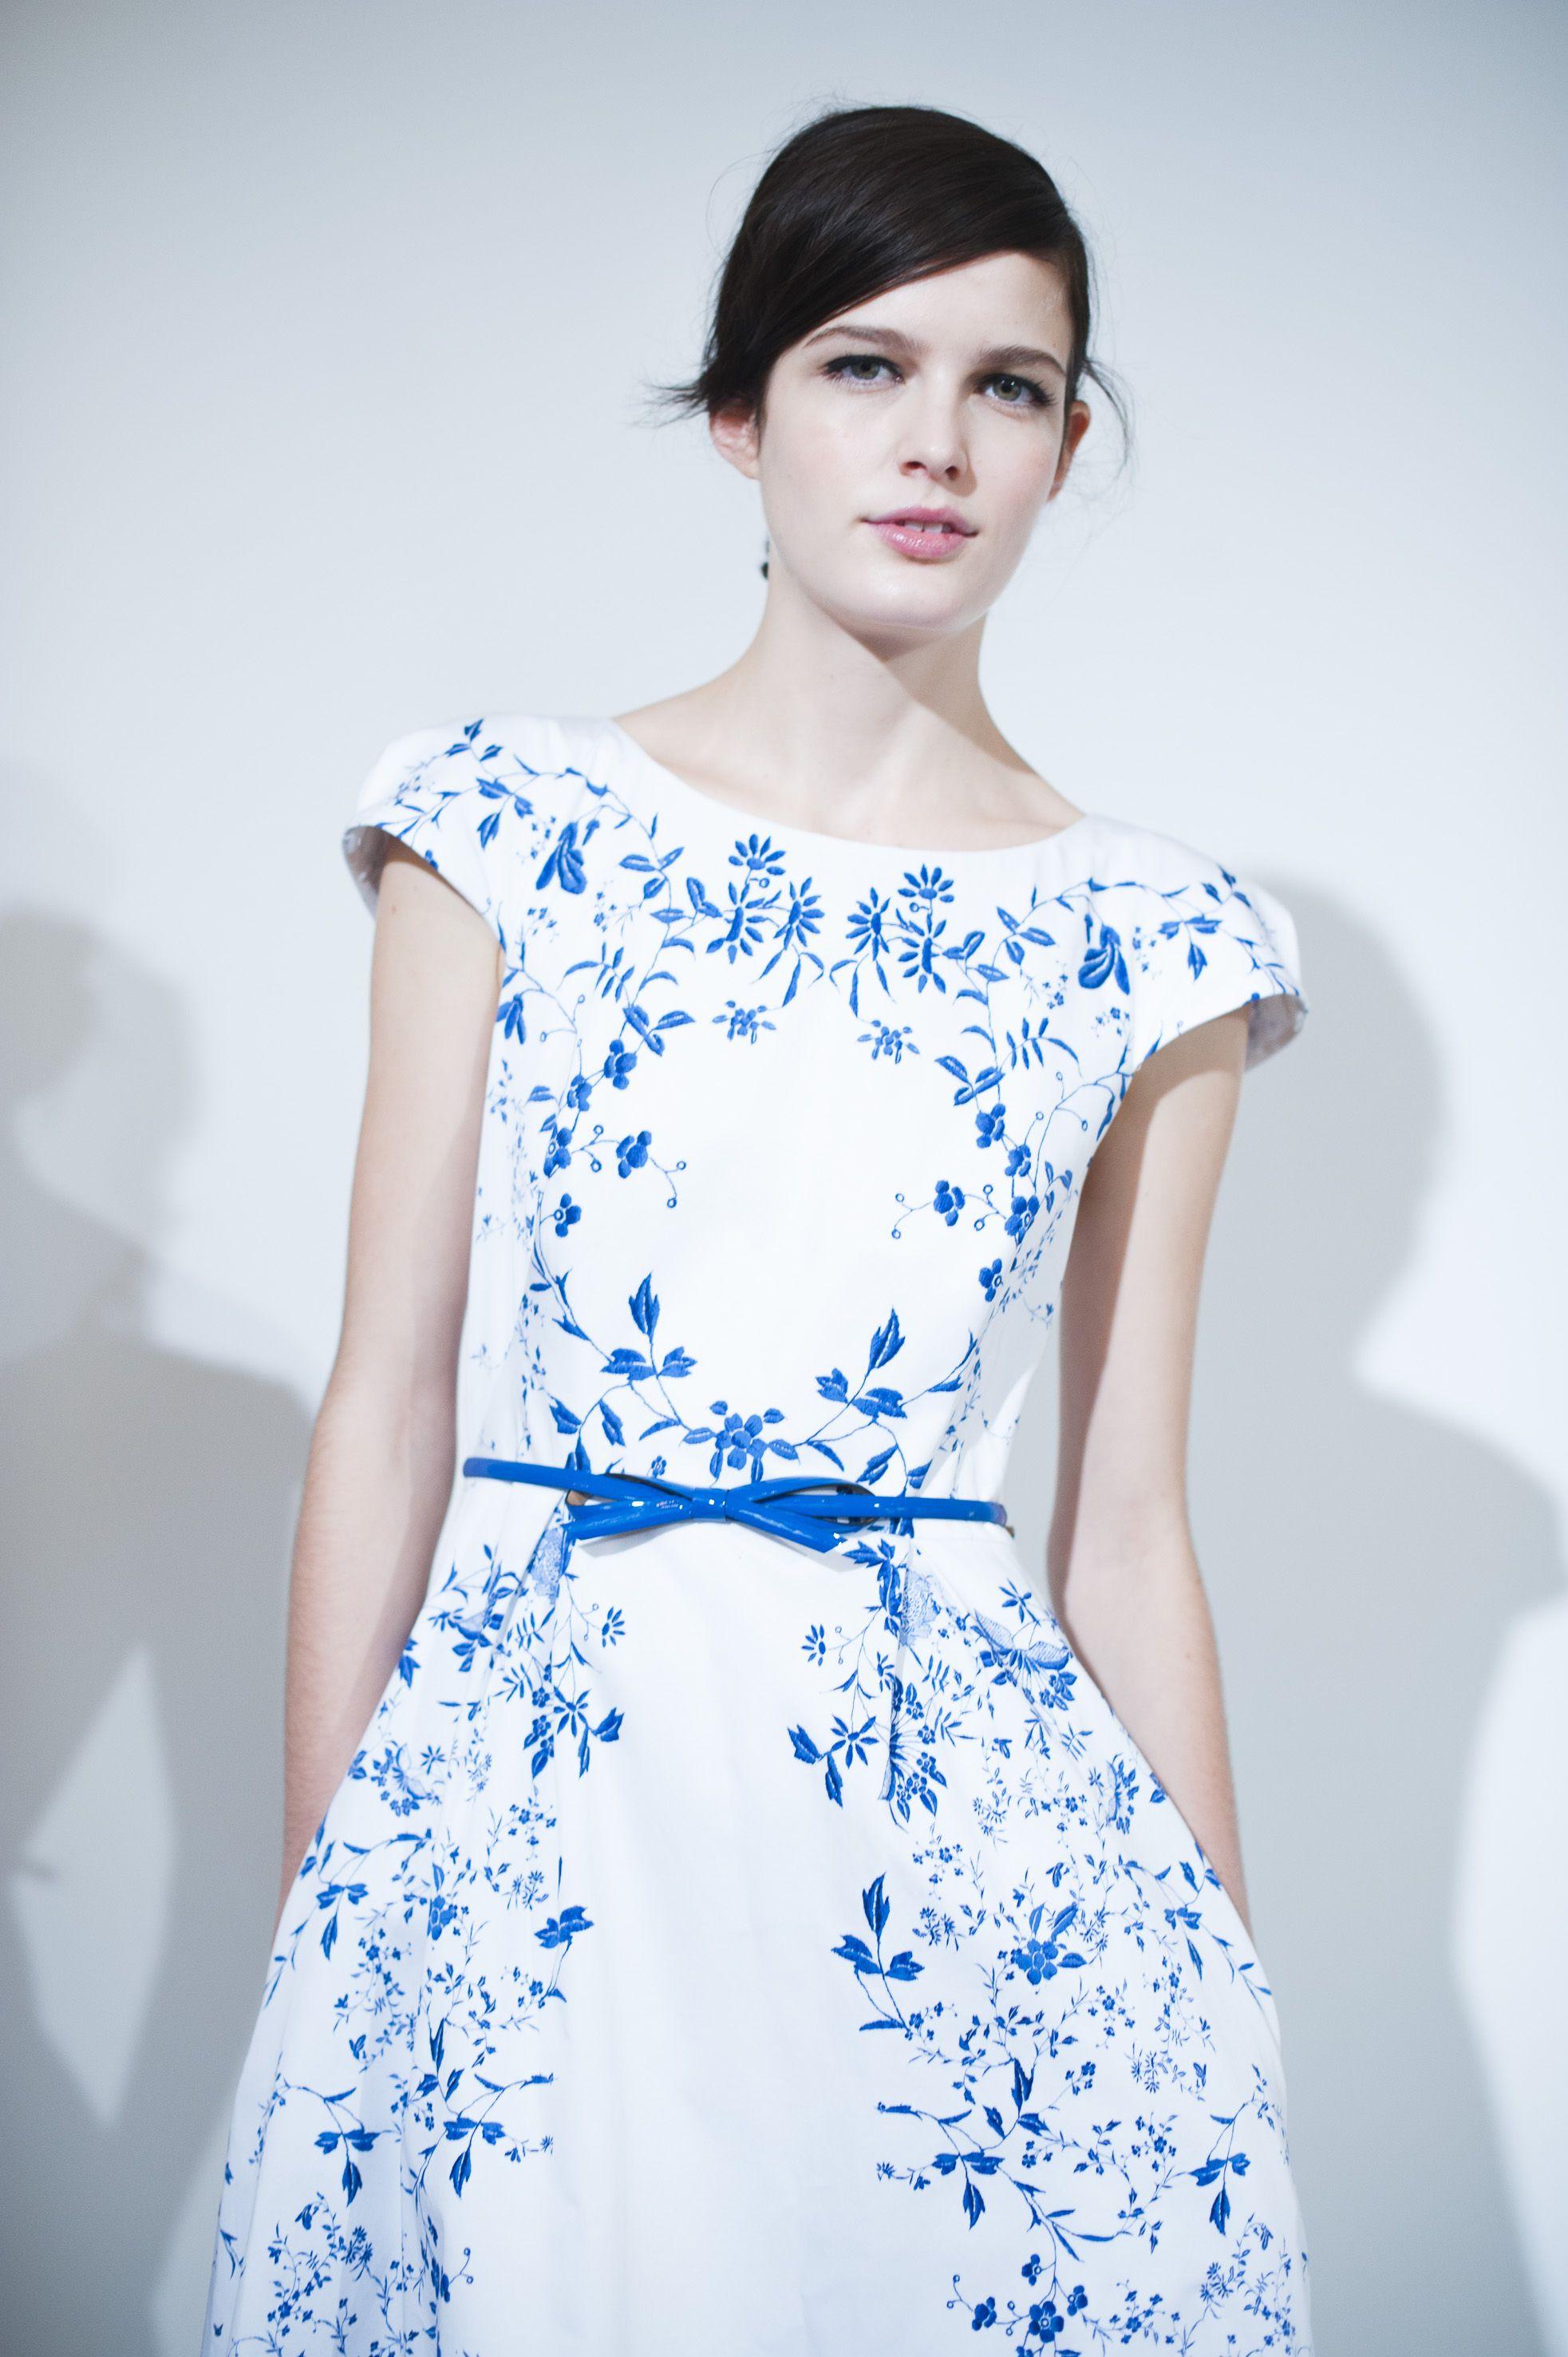 Hobbs Invitation Blue White China Placement Pattern Dress Fashion